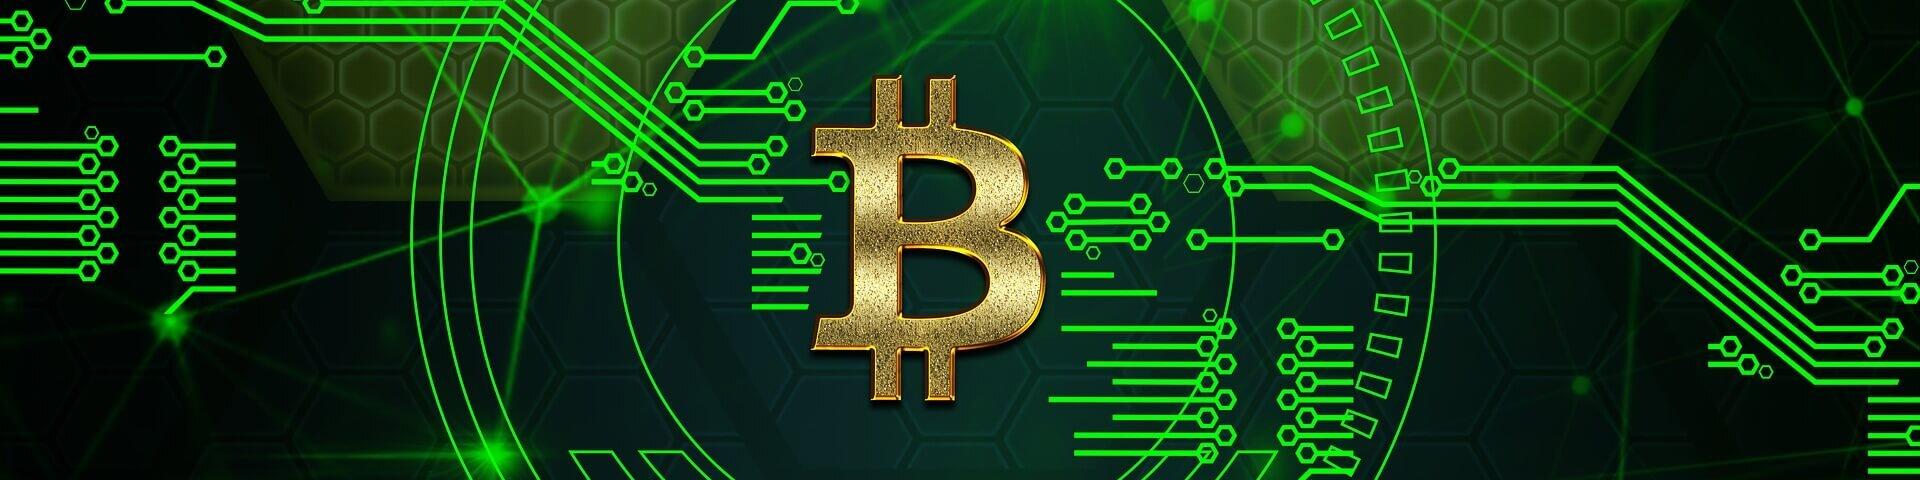 Krypto Plattform